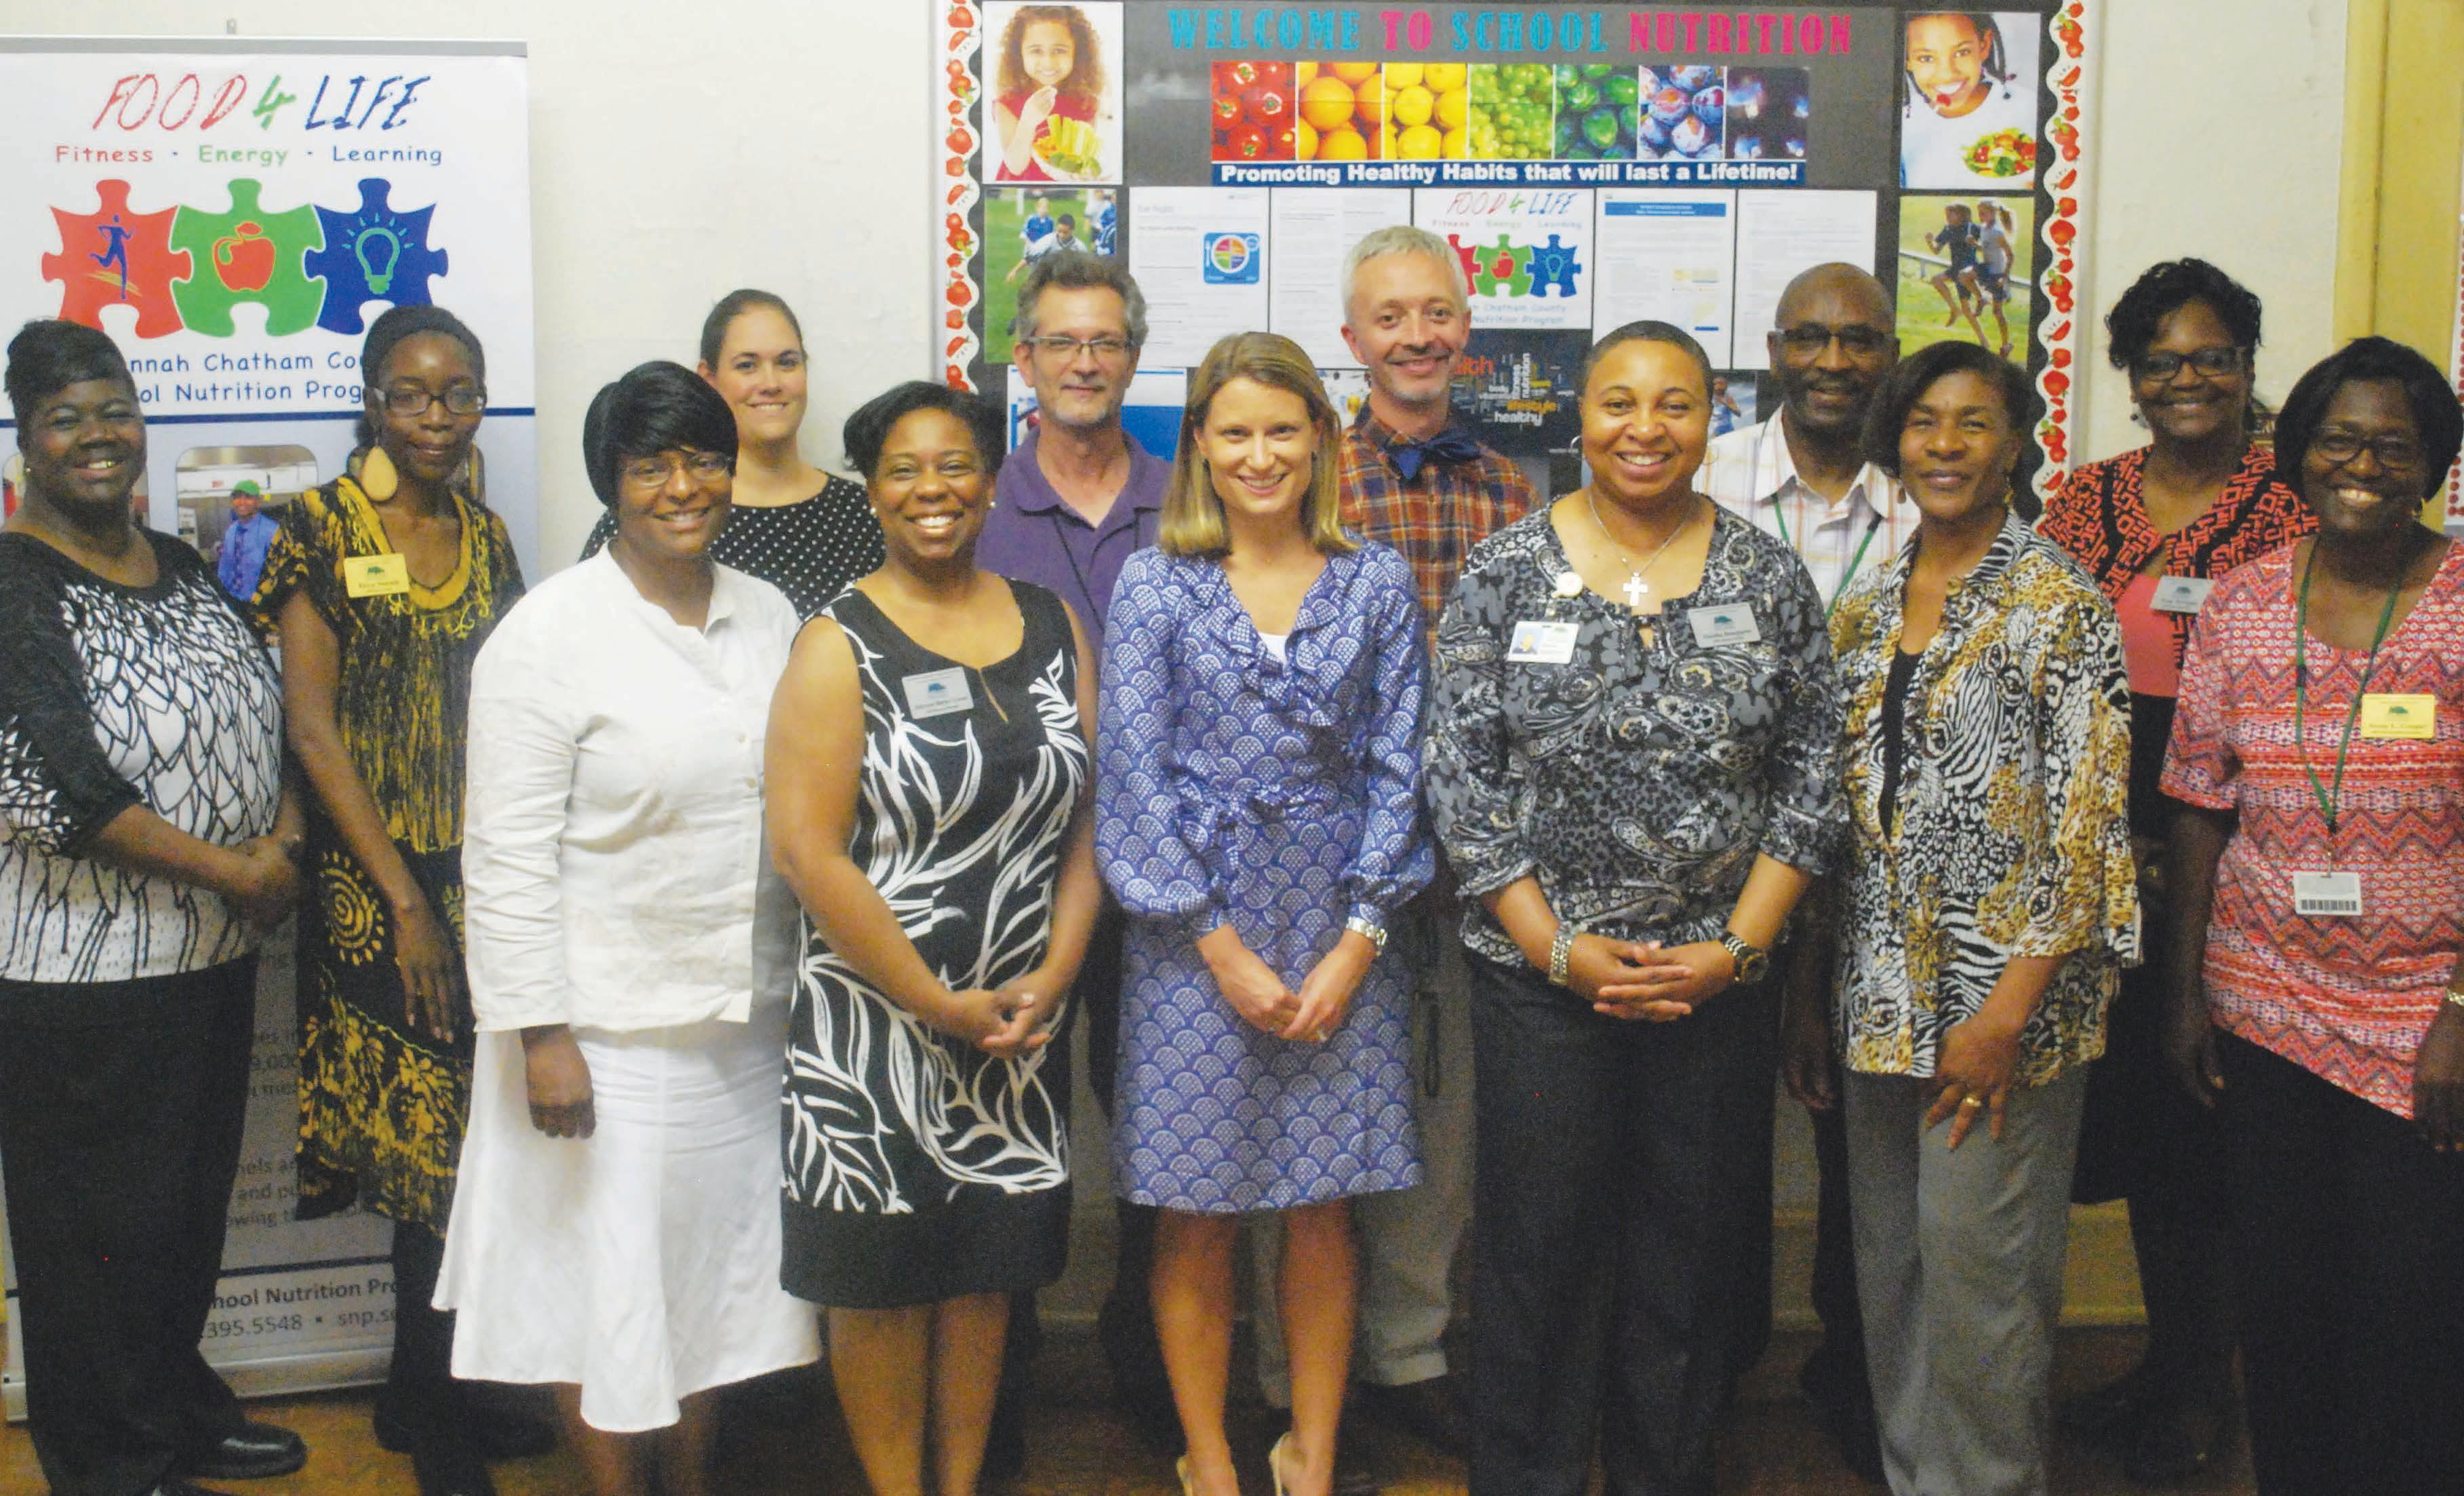 The 11 regional winners of the Georgia USDA Best Practice Award